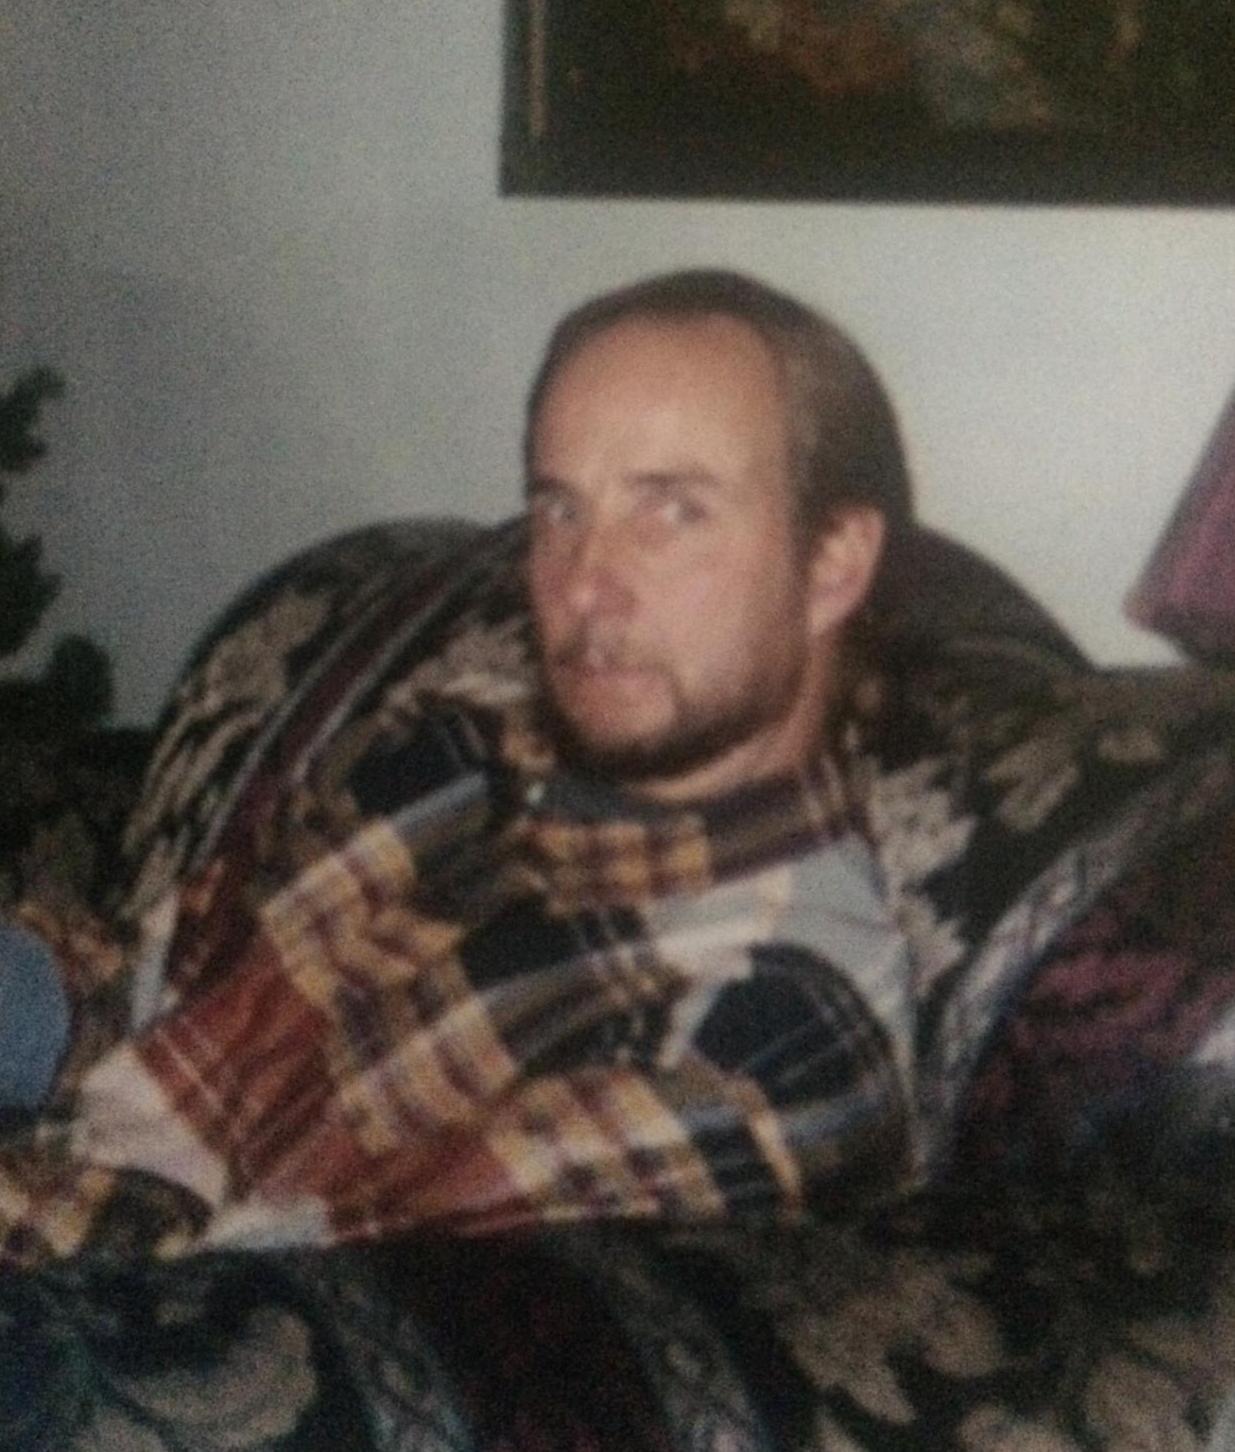 Douglas Lee Schmeeckle 62 Of Cozad Nebraska